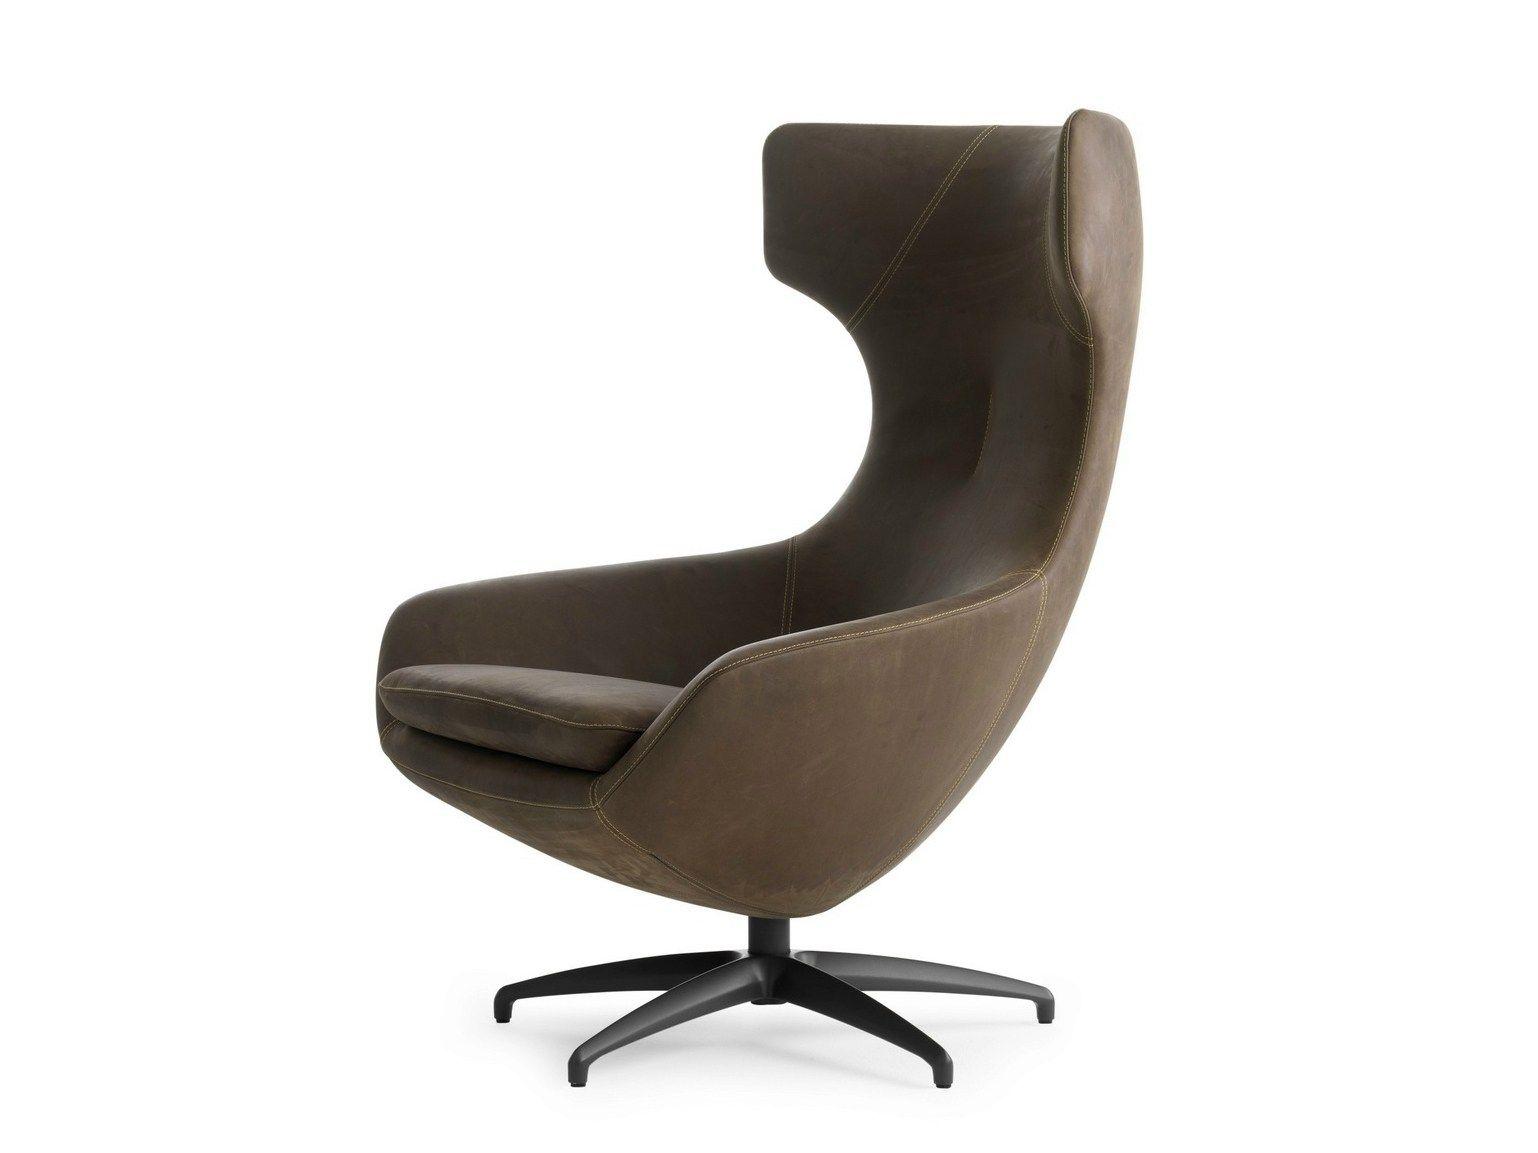 Caruzzo Leather Armchair By Leolux Design Frans Schrofer